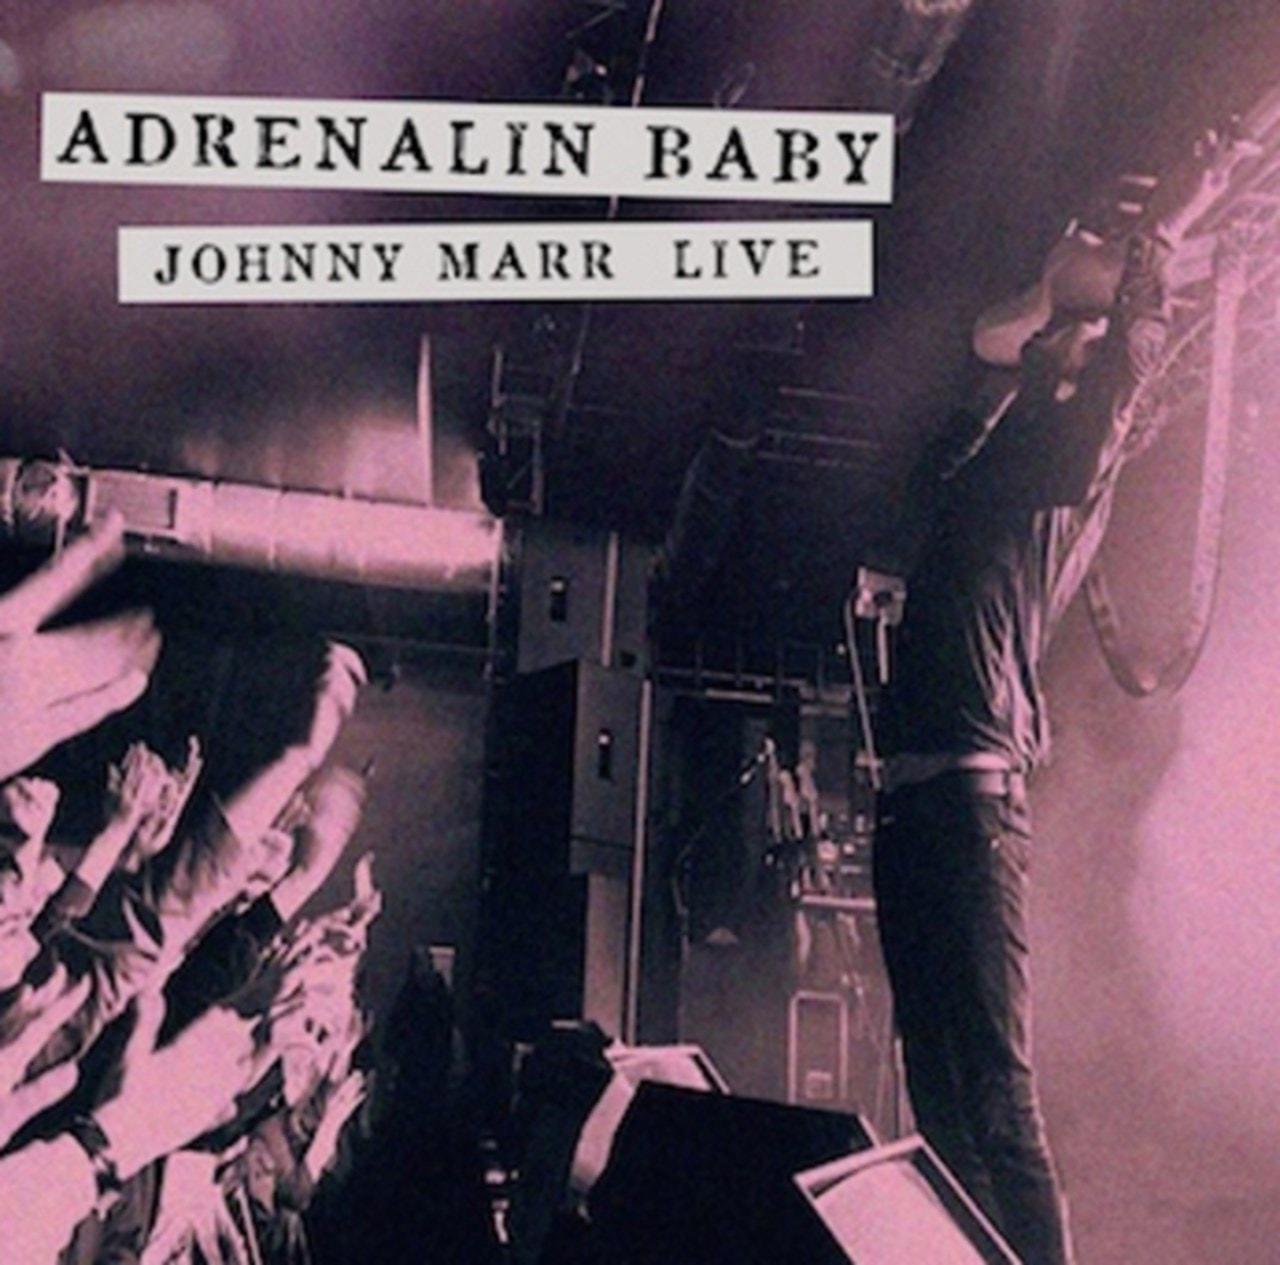 Adrenalin Baby - 1